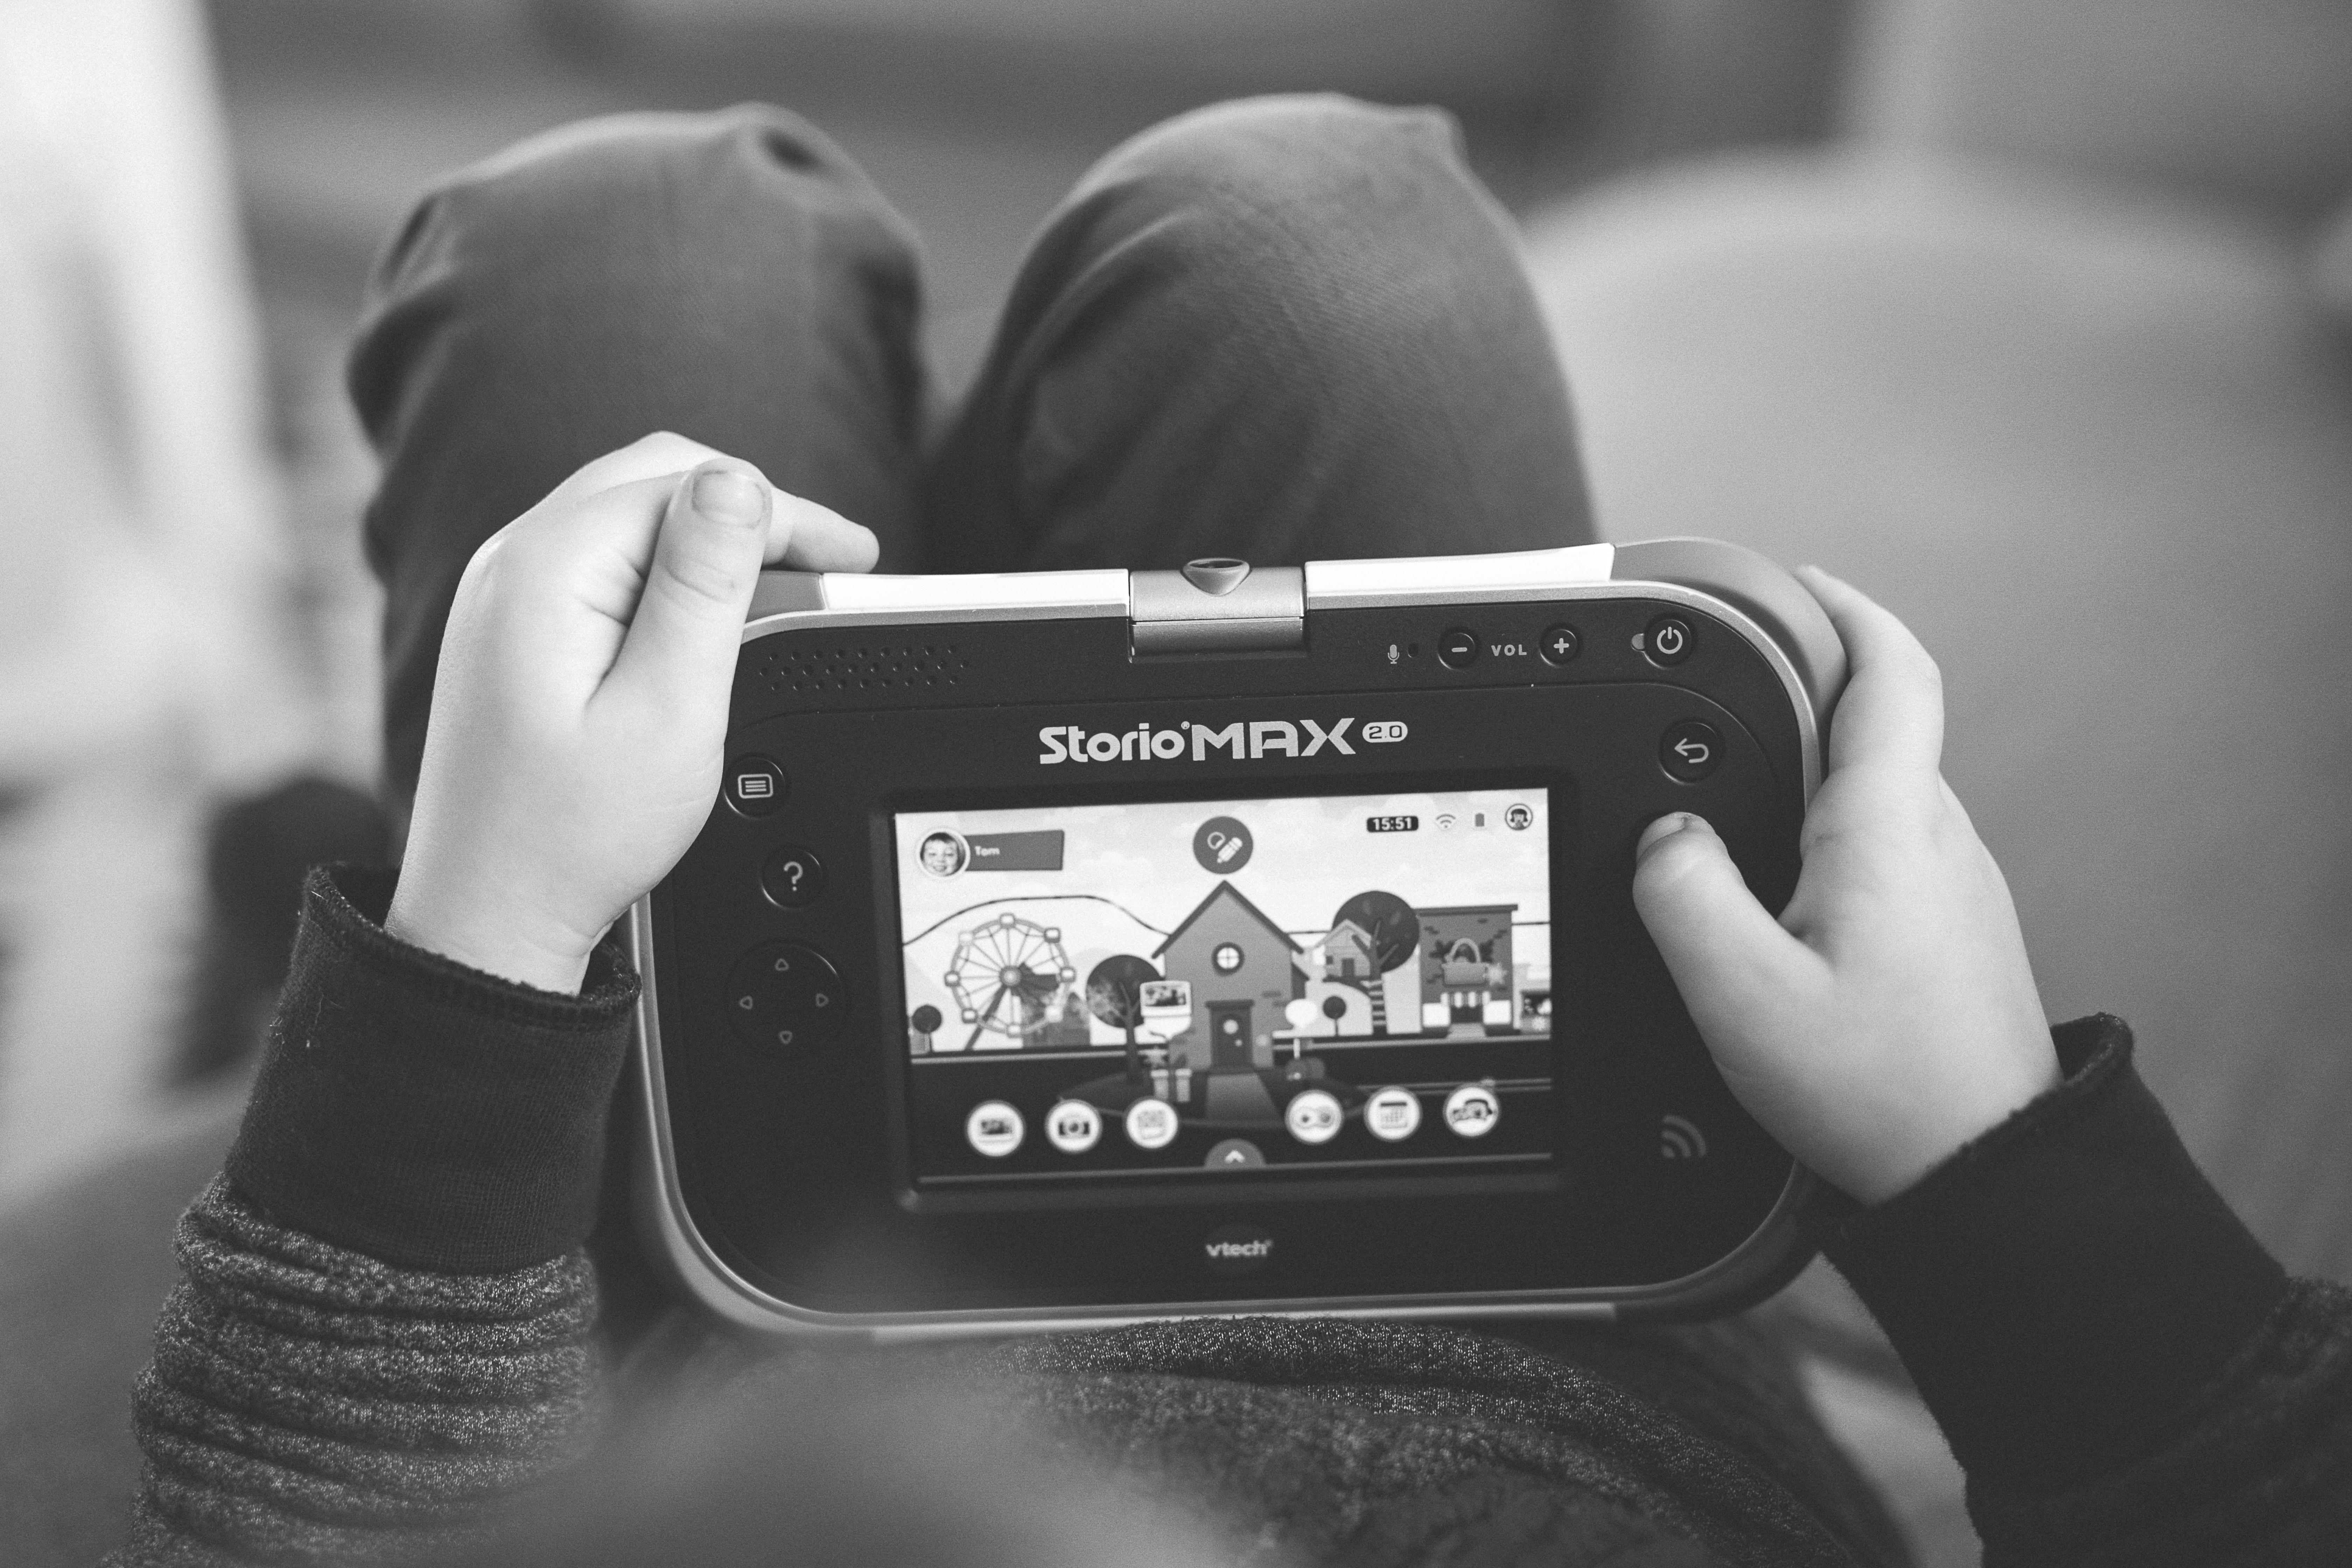 tablette storio max vtech